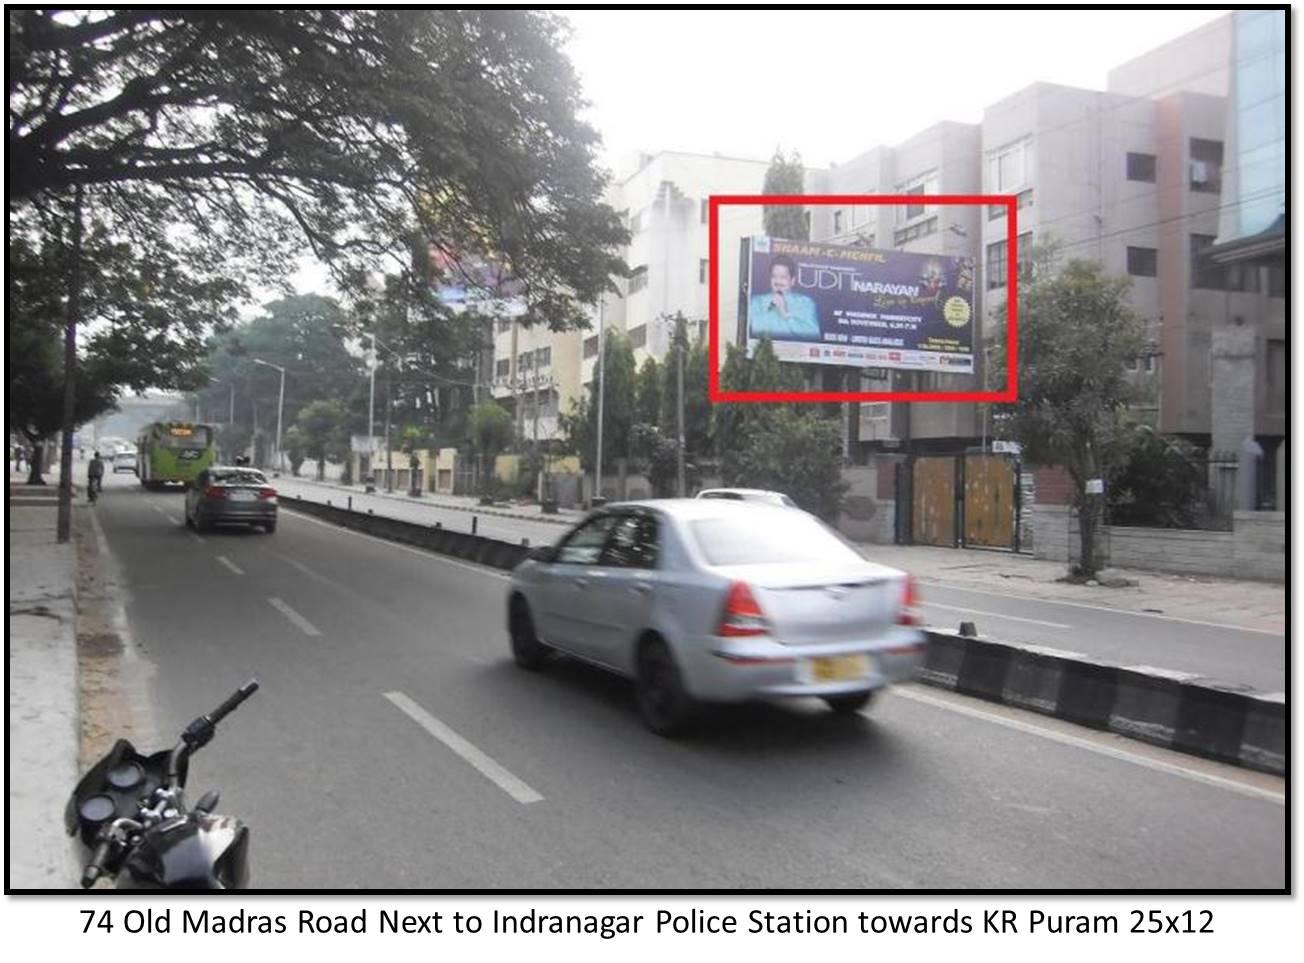 Old Madras Road Next to Indranagar Police Station, Bengaluru